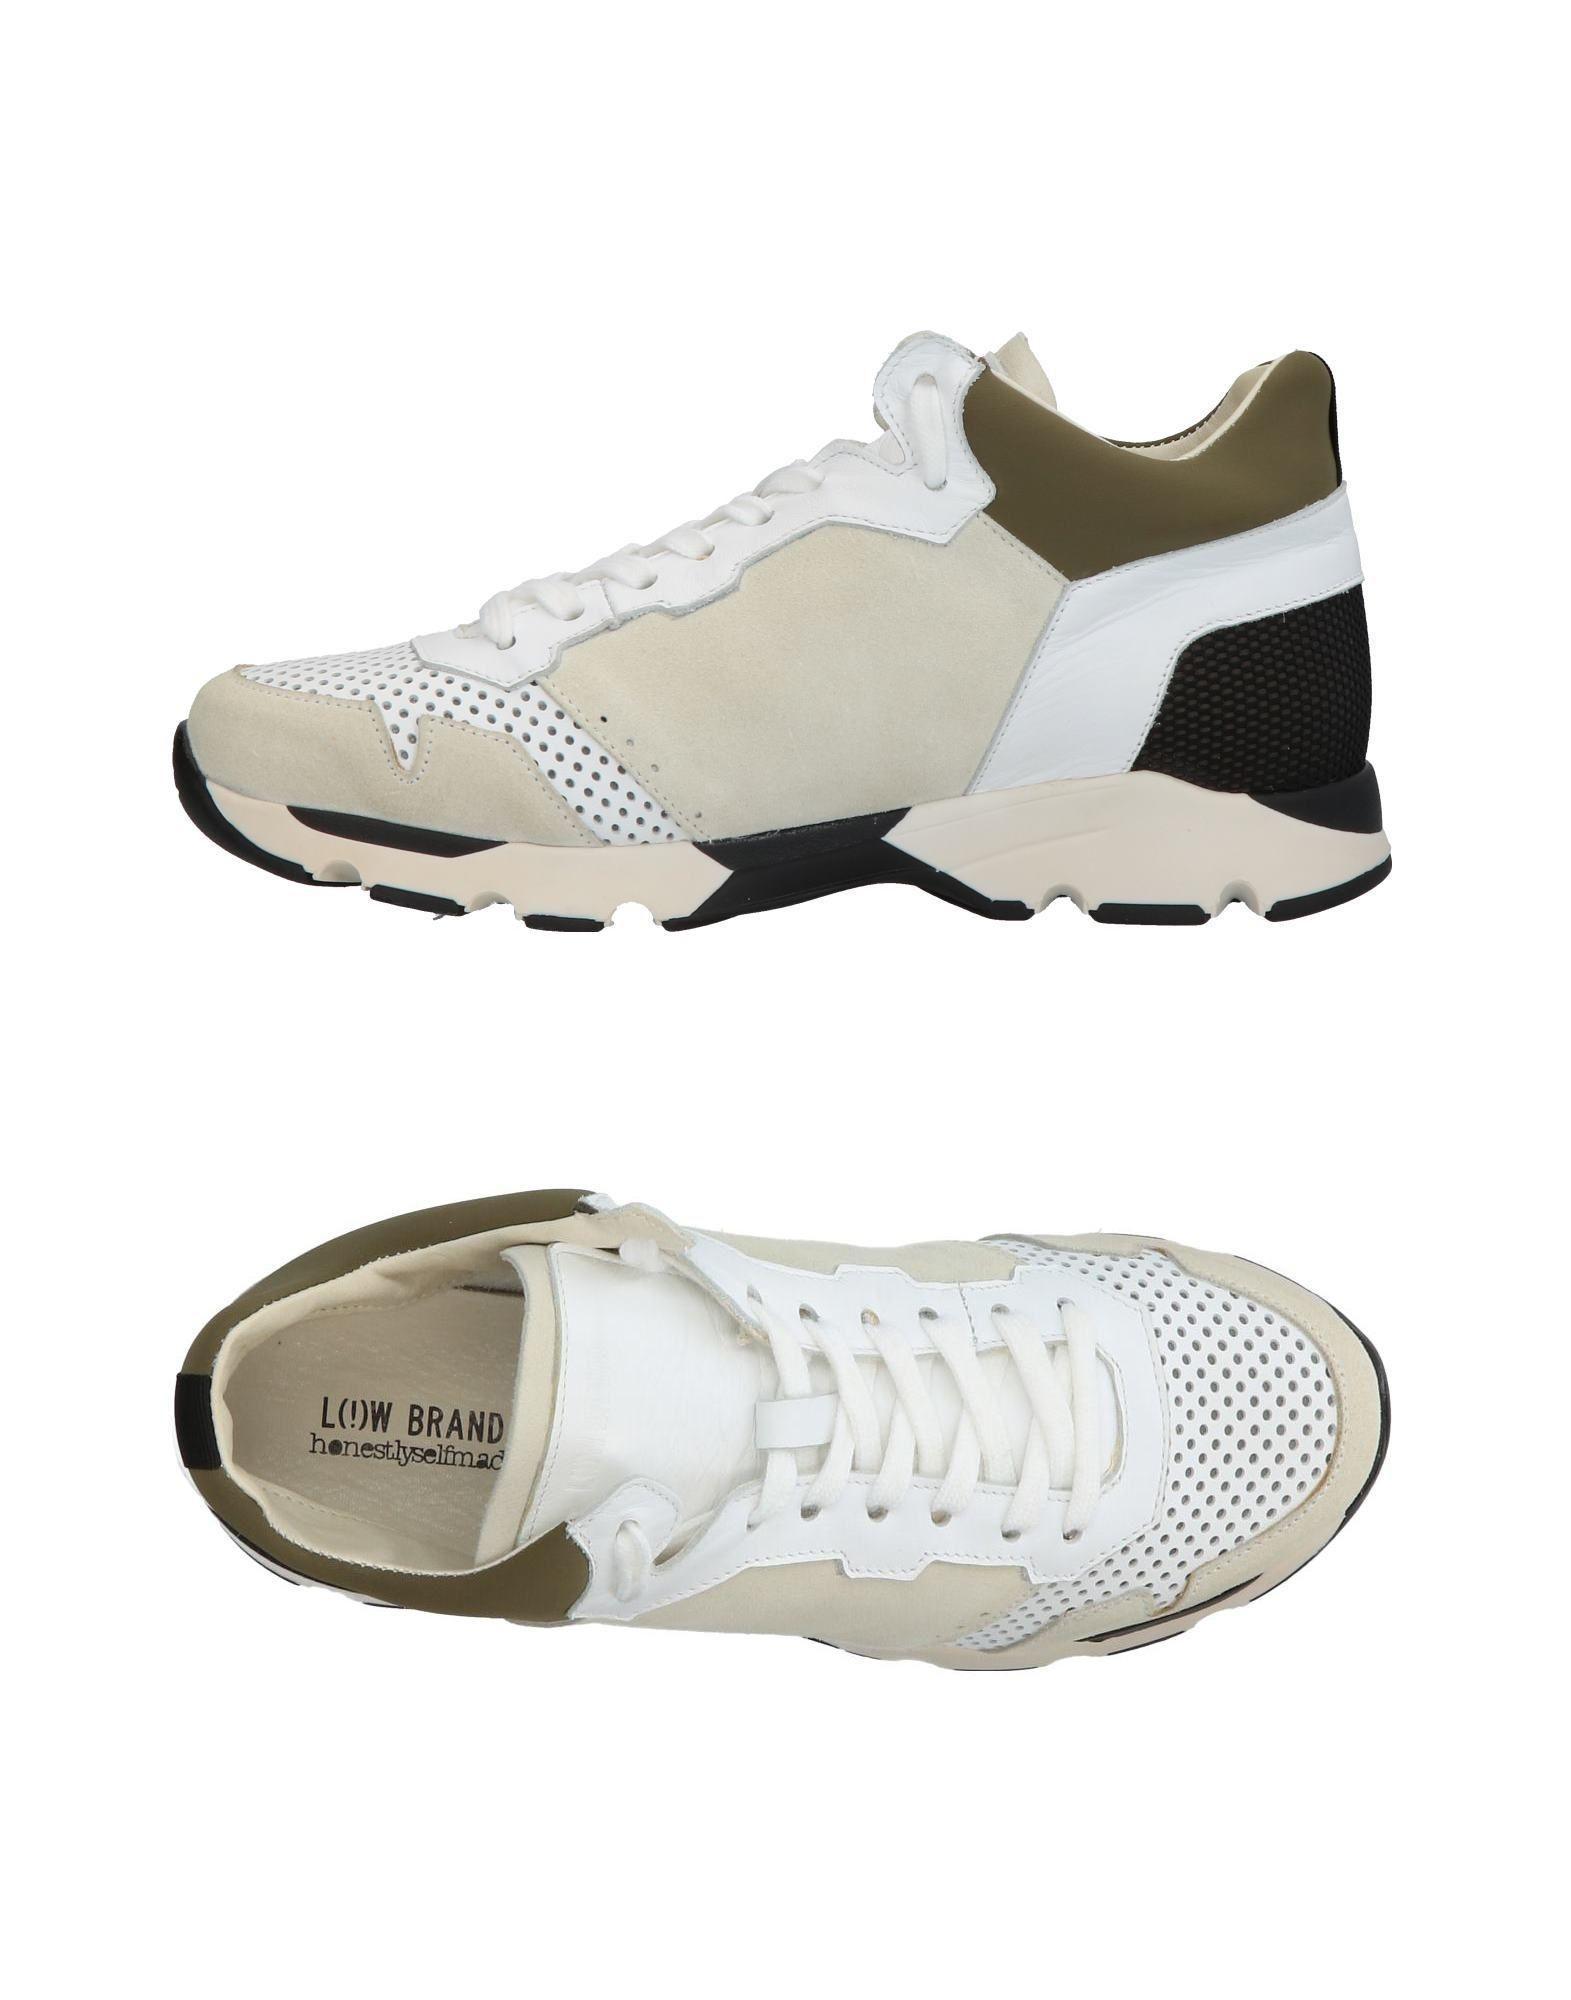 Low Brand Sneakers In Beige